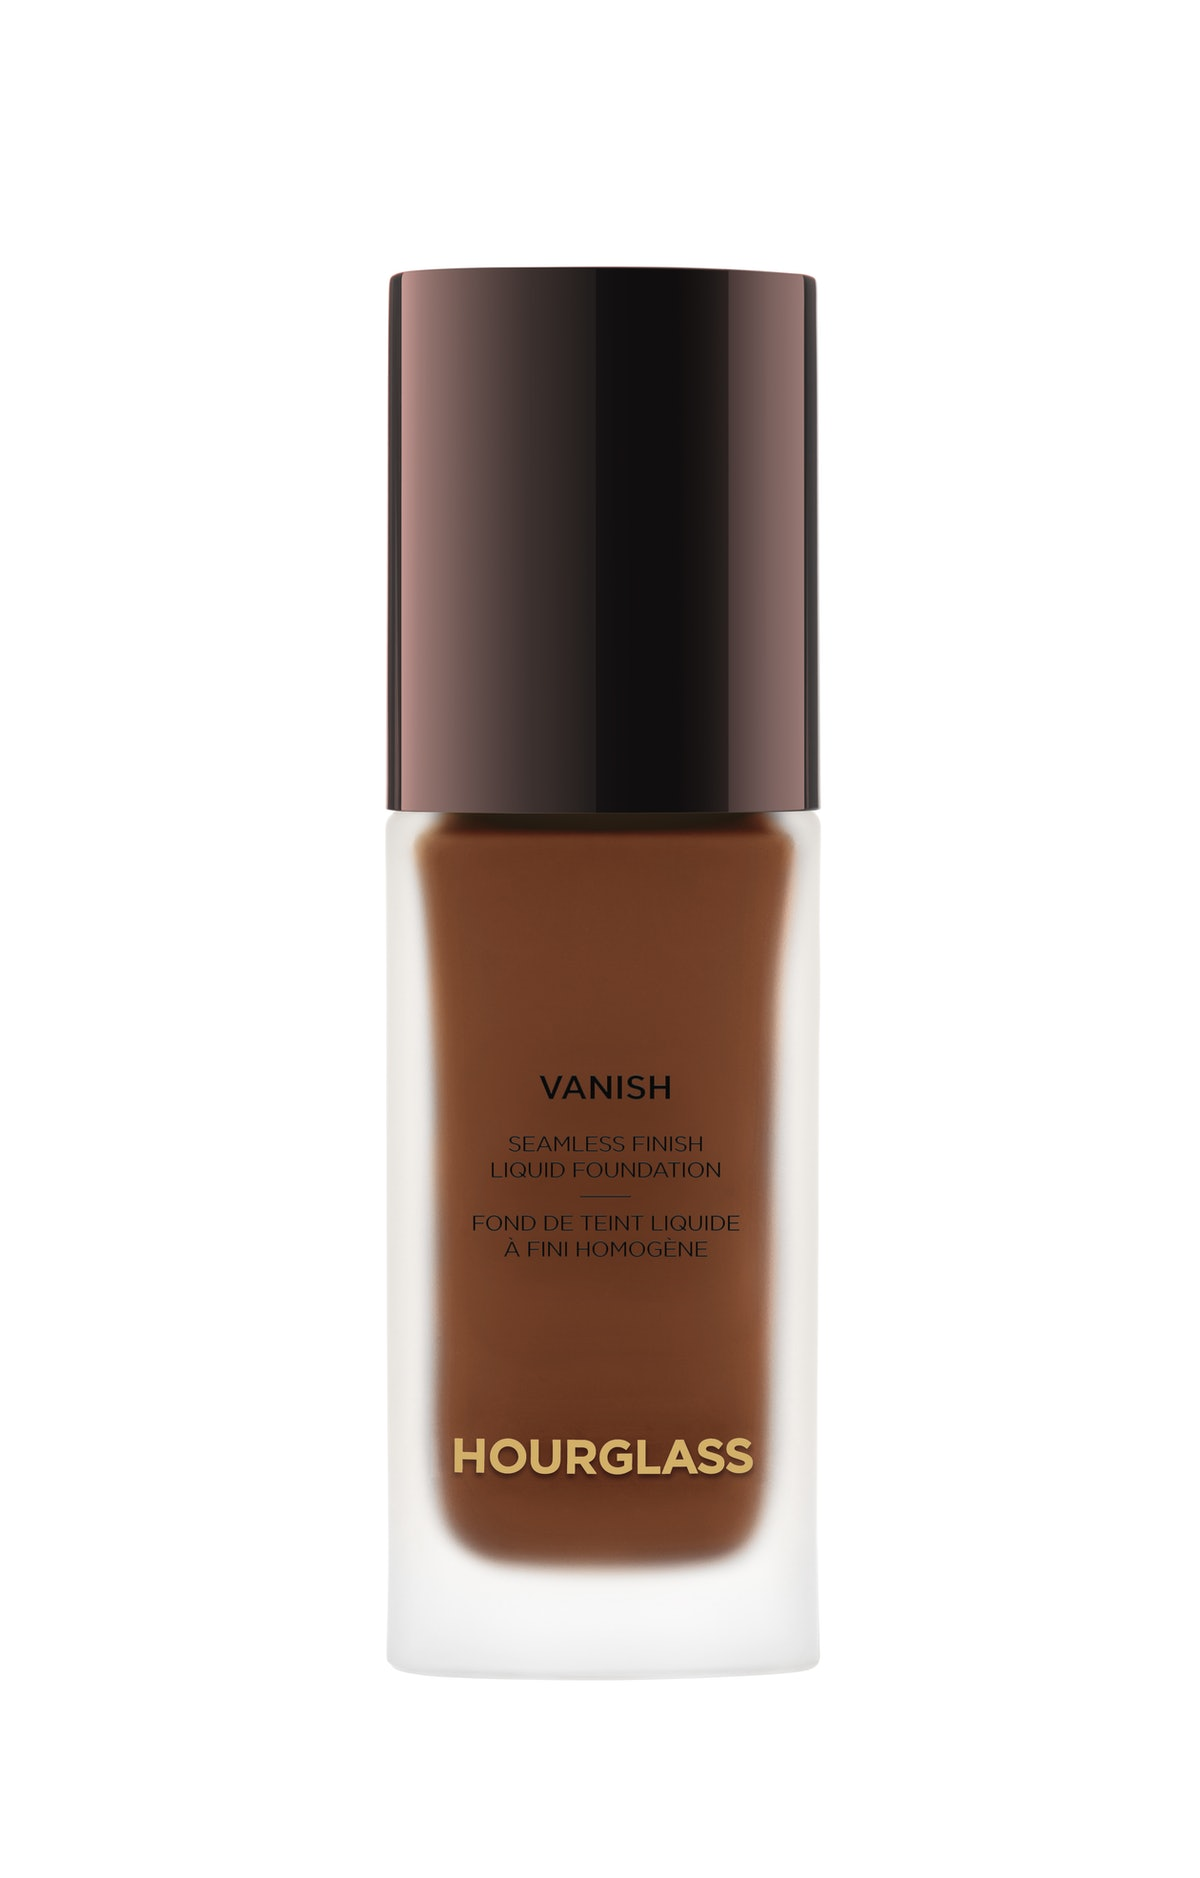 Vanish Seamless Finish Liquid Foundation